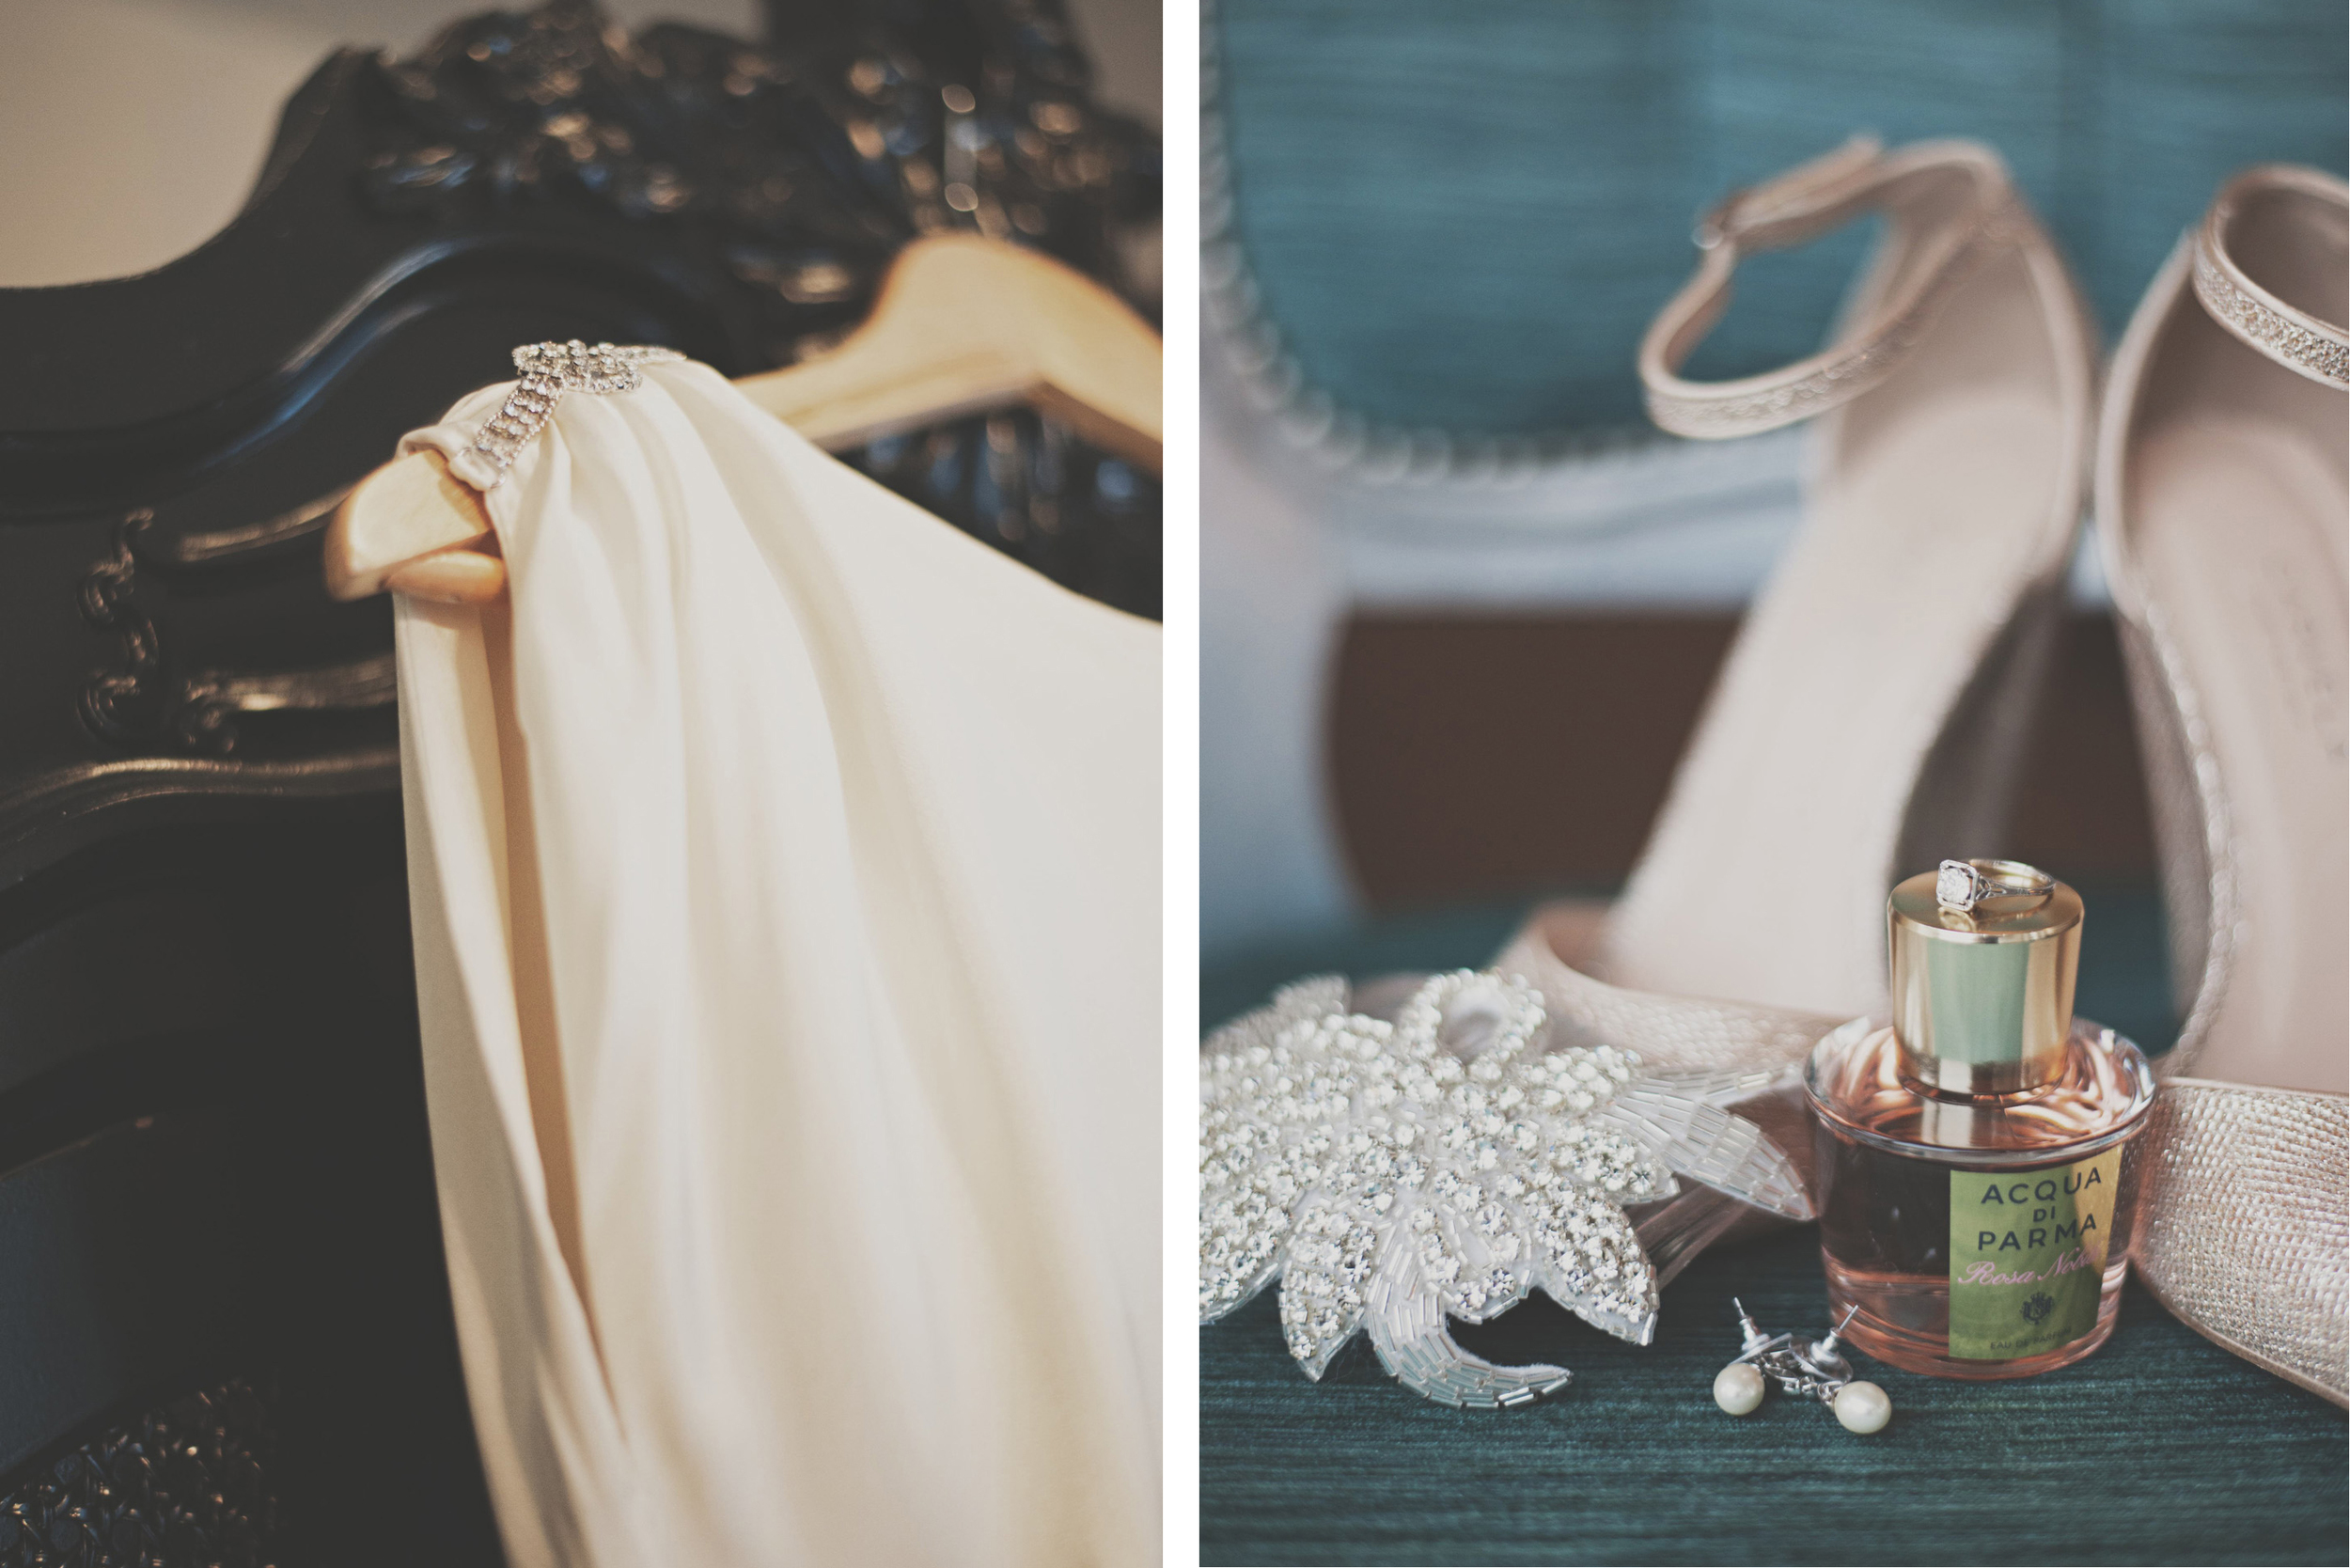 Bride's dress and shoe details